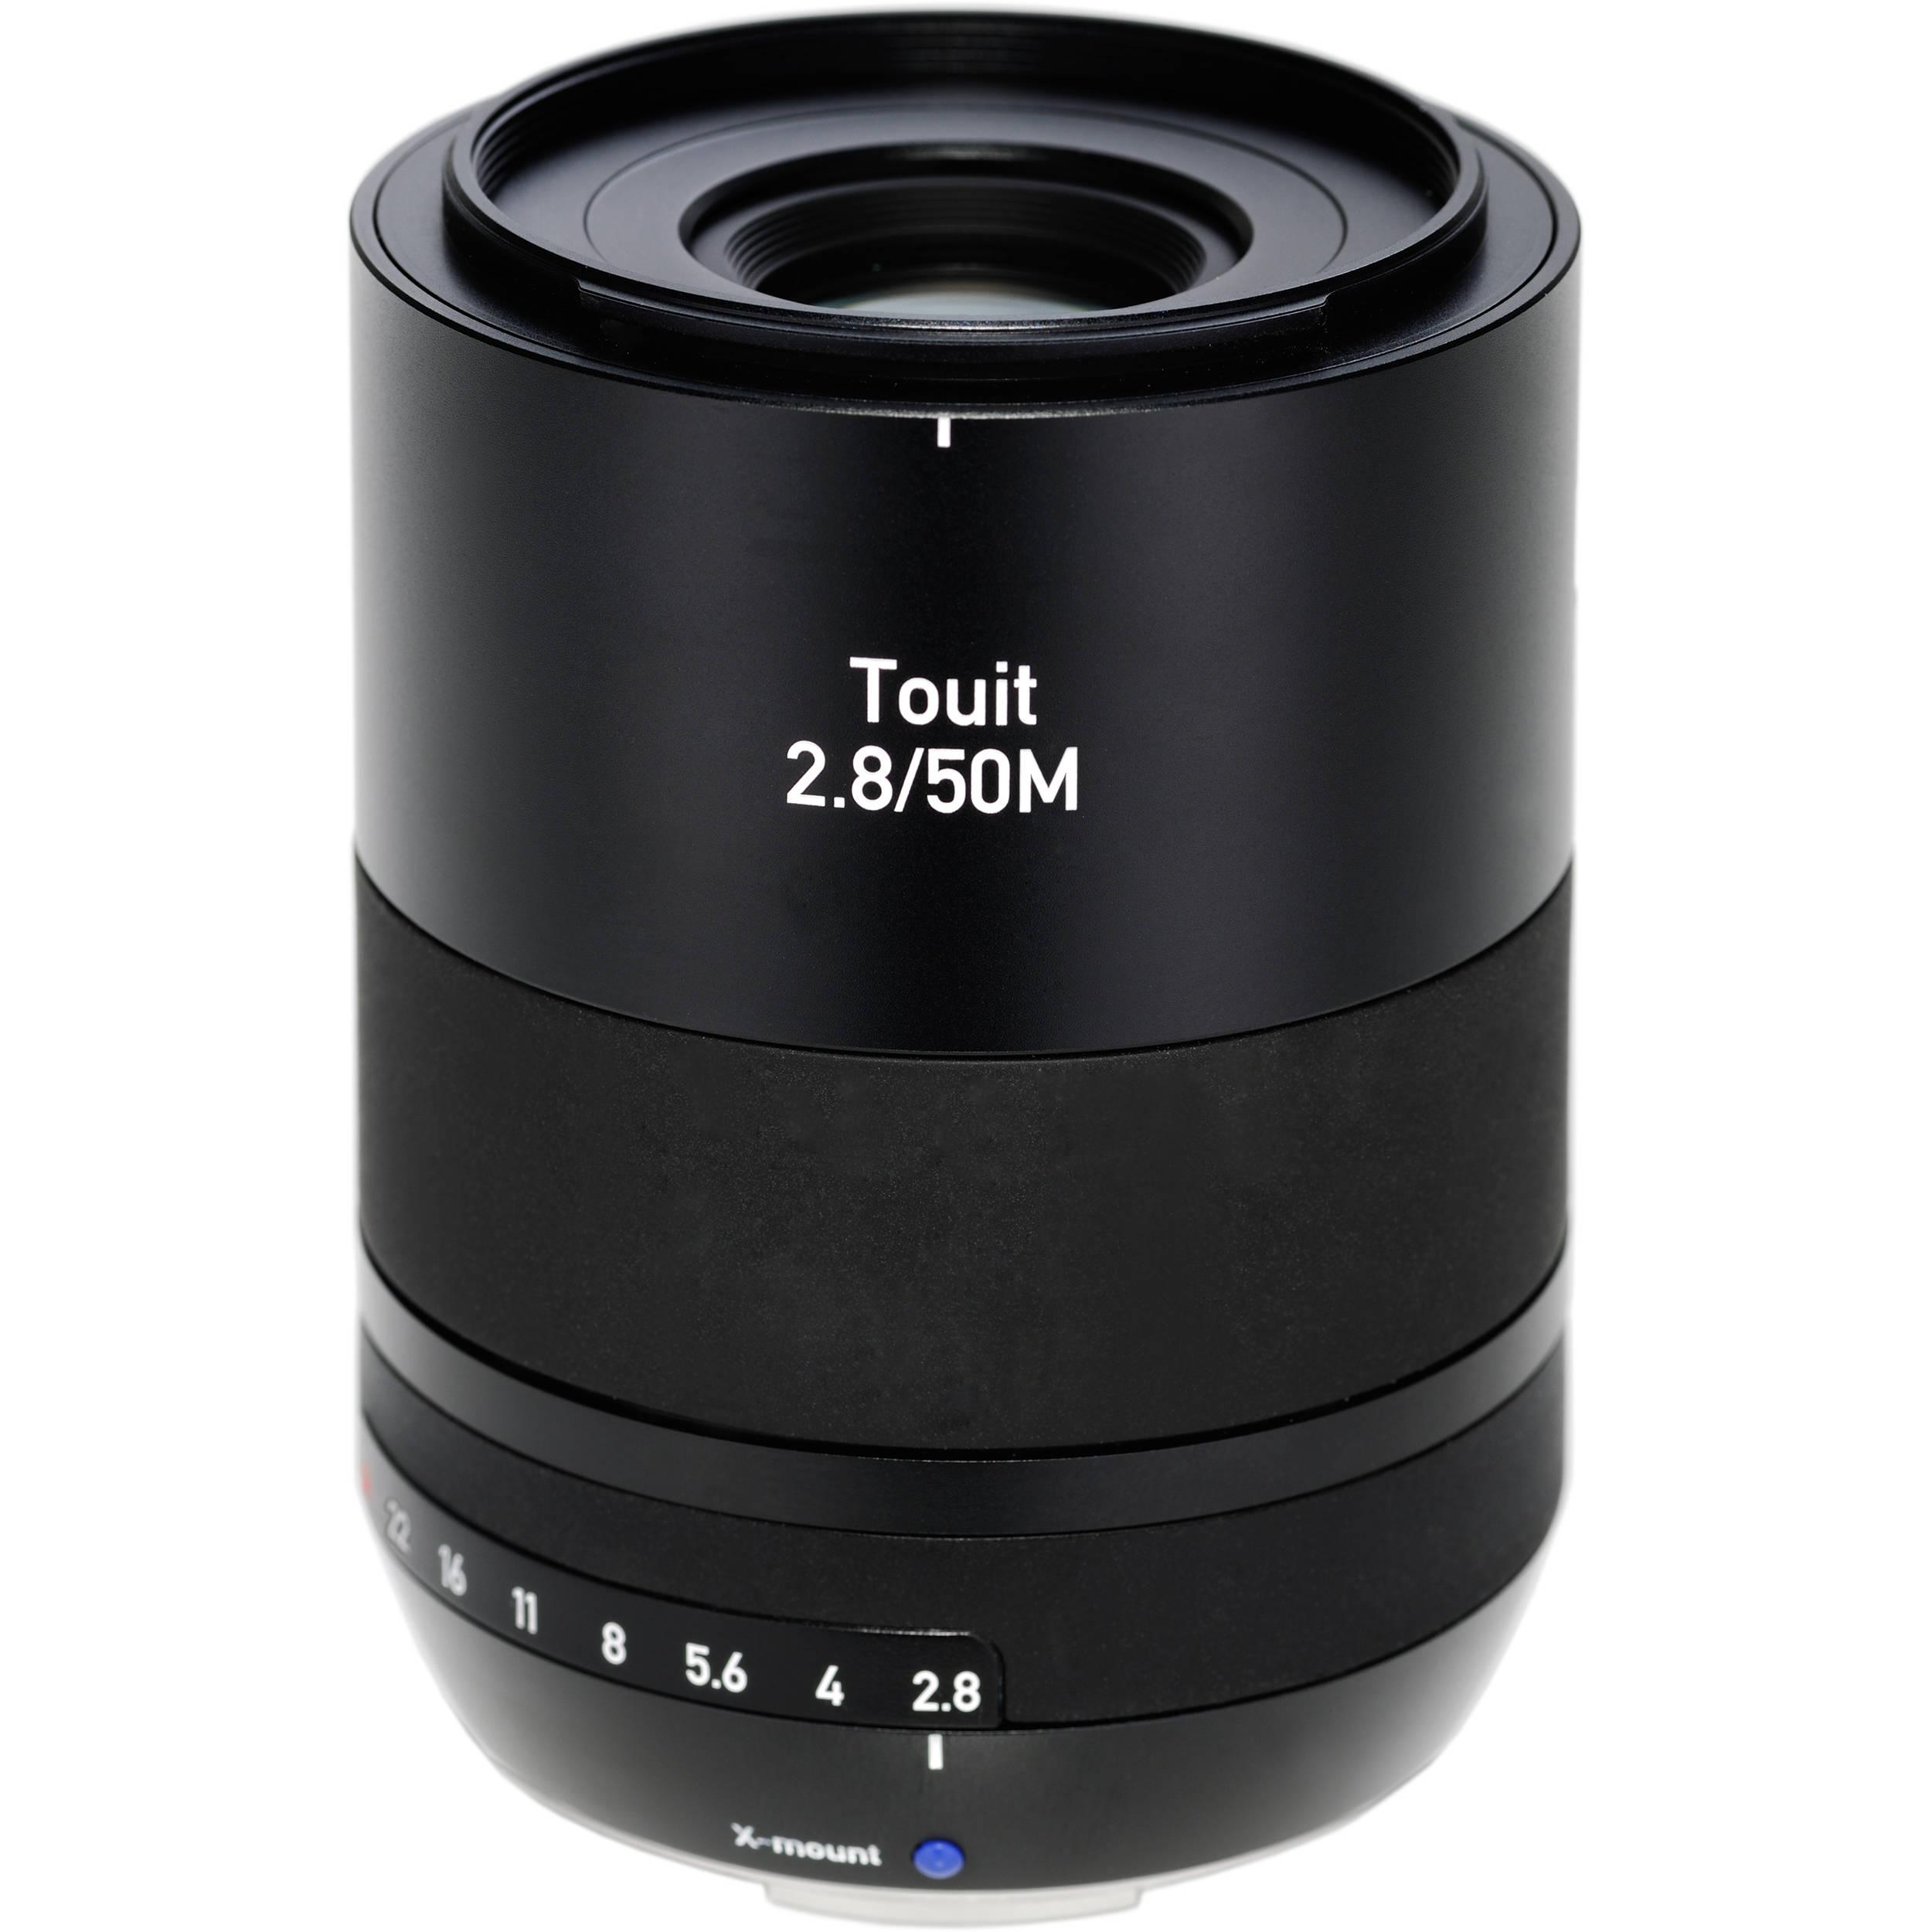 Zeiss Touit 50mm F 28m Macro Lens Fujifilm X Mount 2030 681 7artisans 12mm 28 For Fuji Black